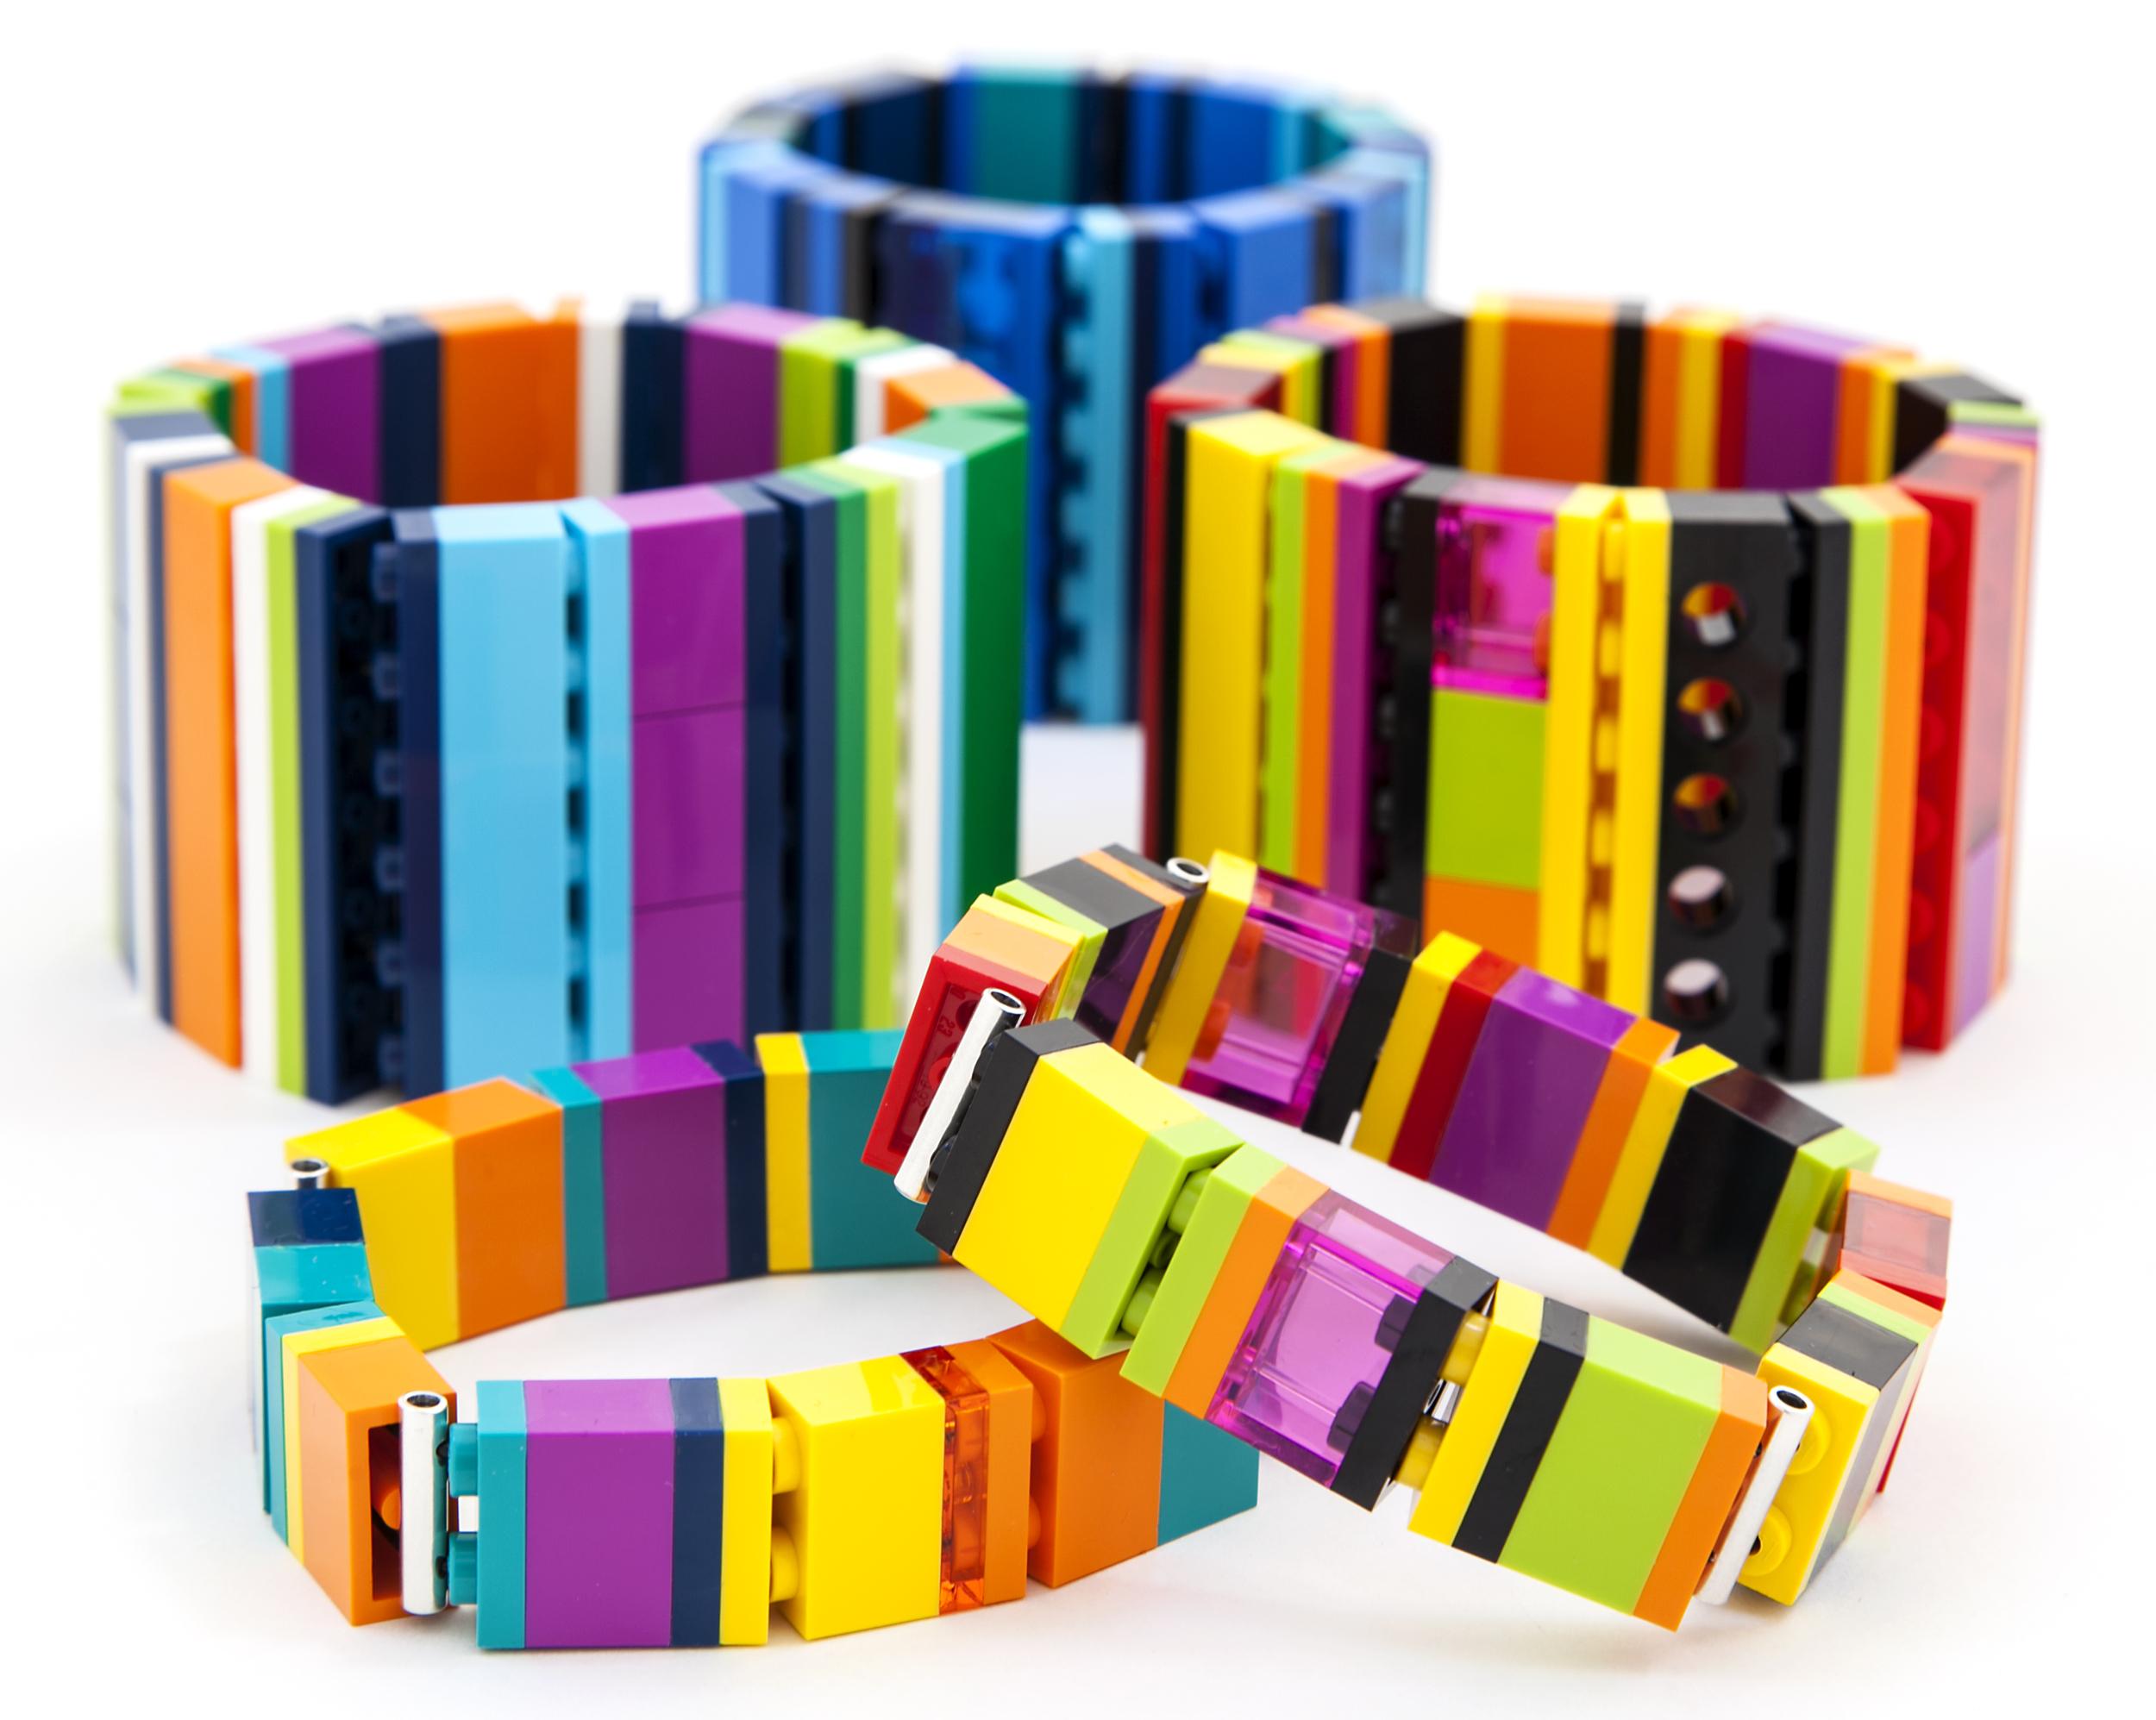 emiko's best sellers, the reware bracelet collection